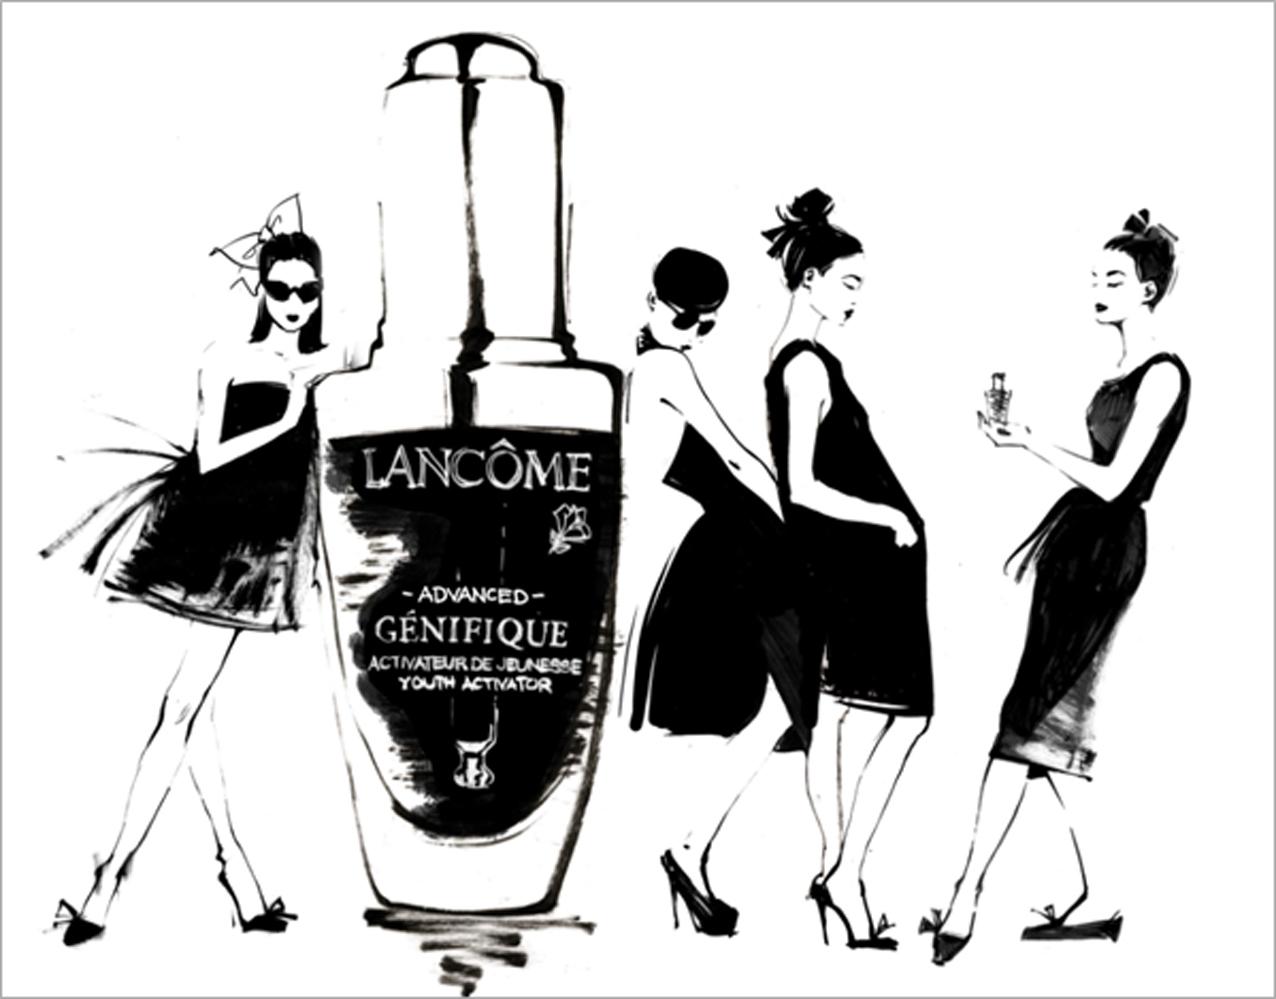 The Little Black Bottle By Lancome Exhibition Concerts